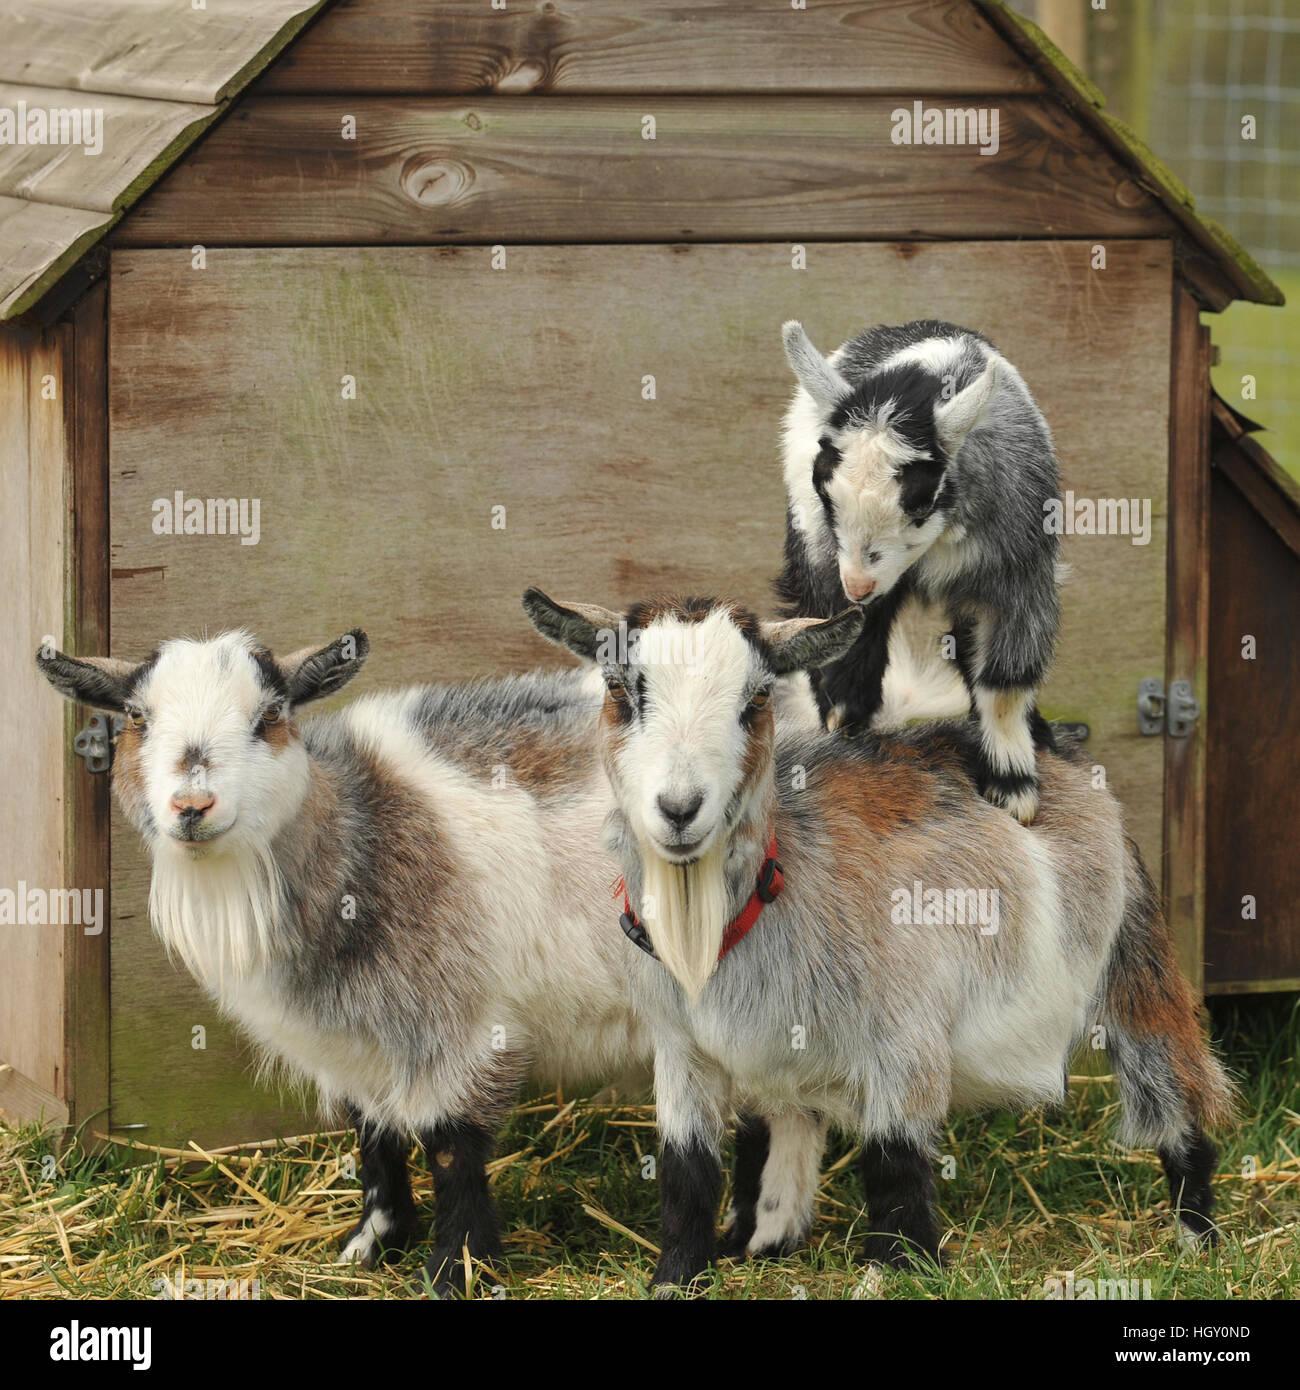 pygmy goats - Stock Image